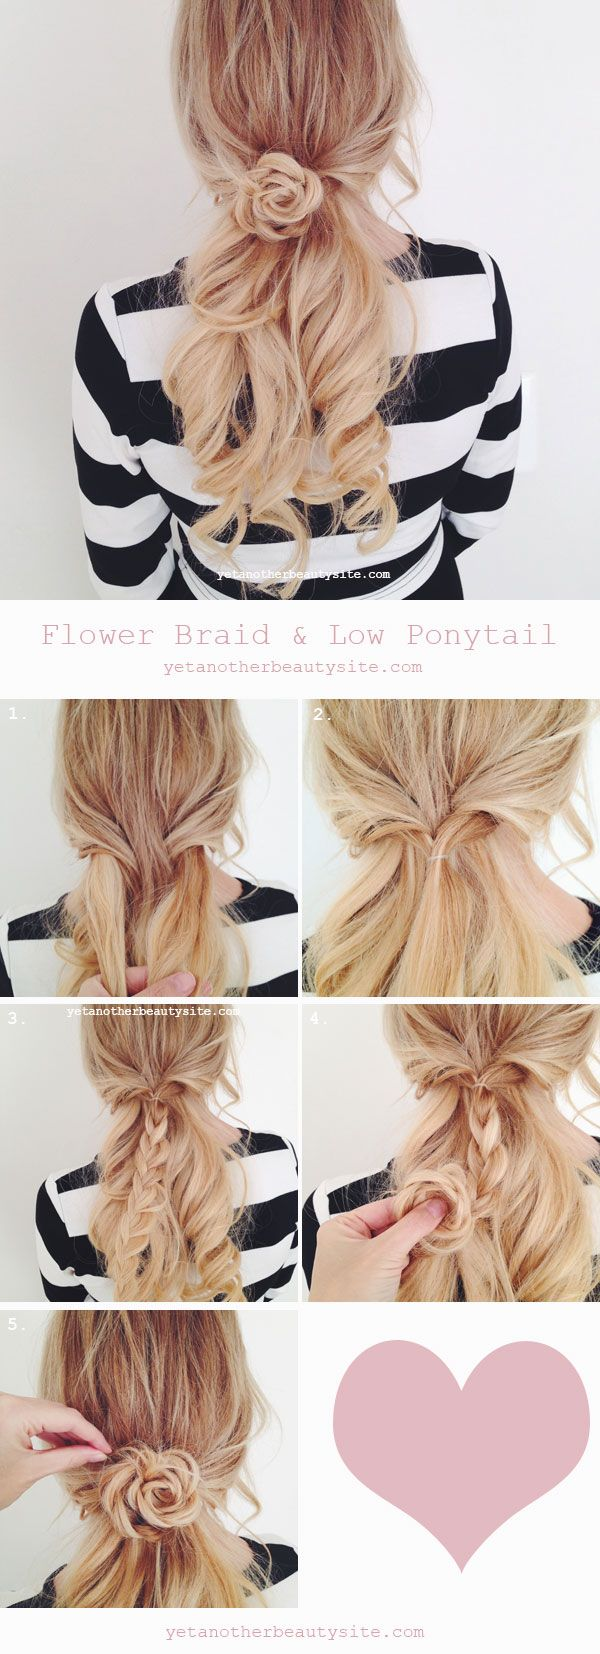 Low ponytail u Flower braid Peinados Pinterest Hair lengths